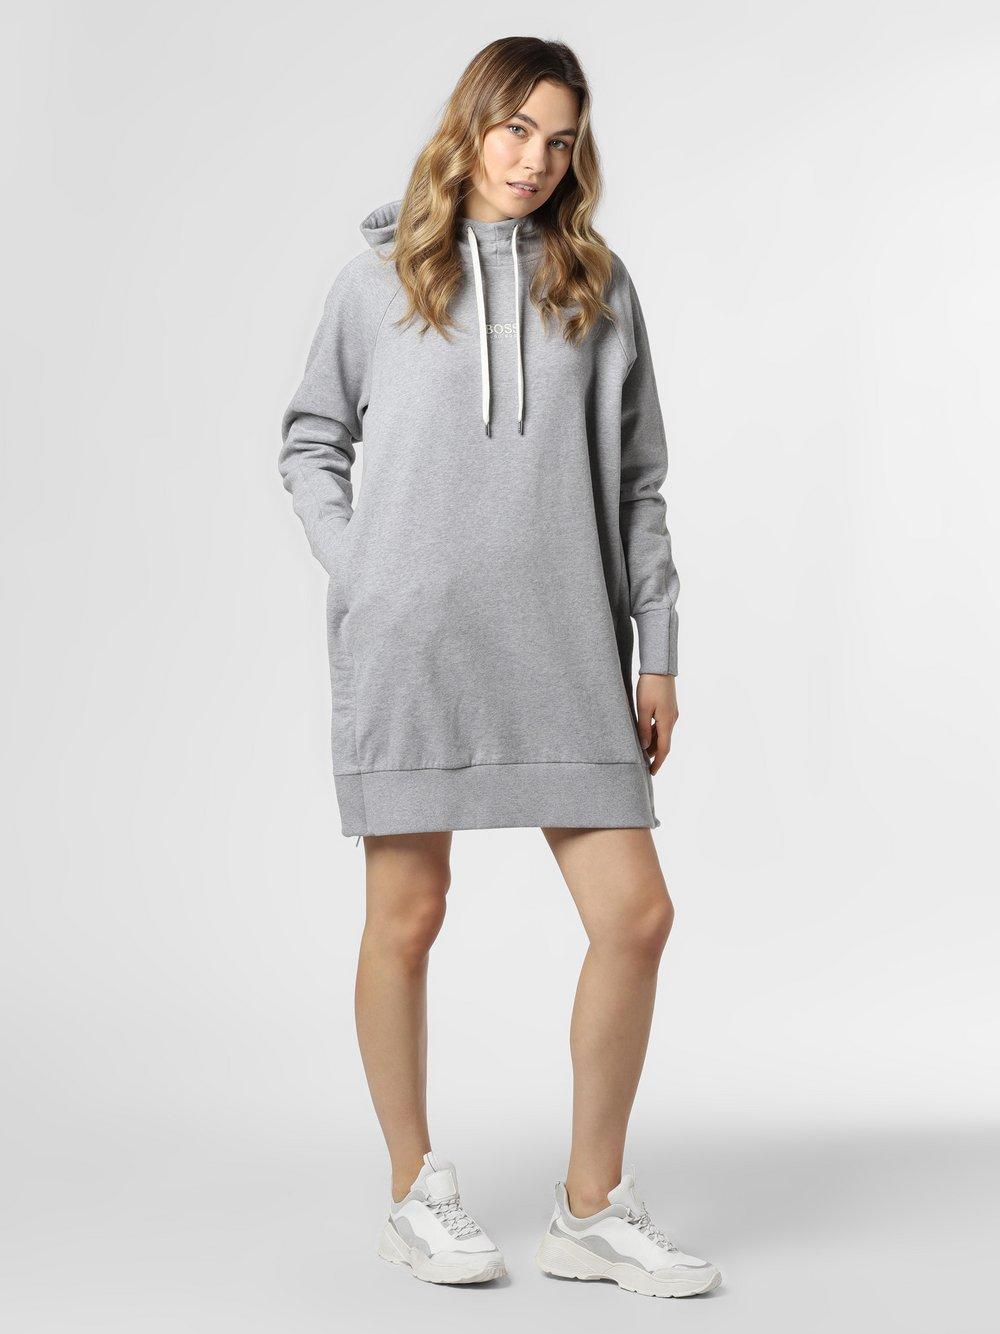 BOSS Casual - Damska sukienka dresowa – C_Ethea_Active, szary